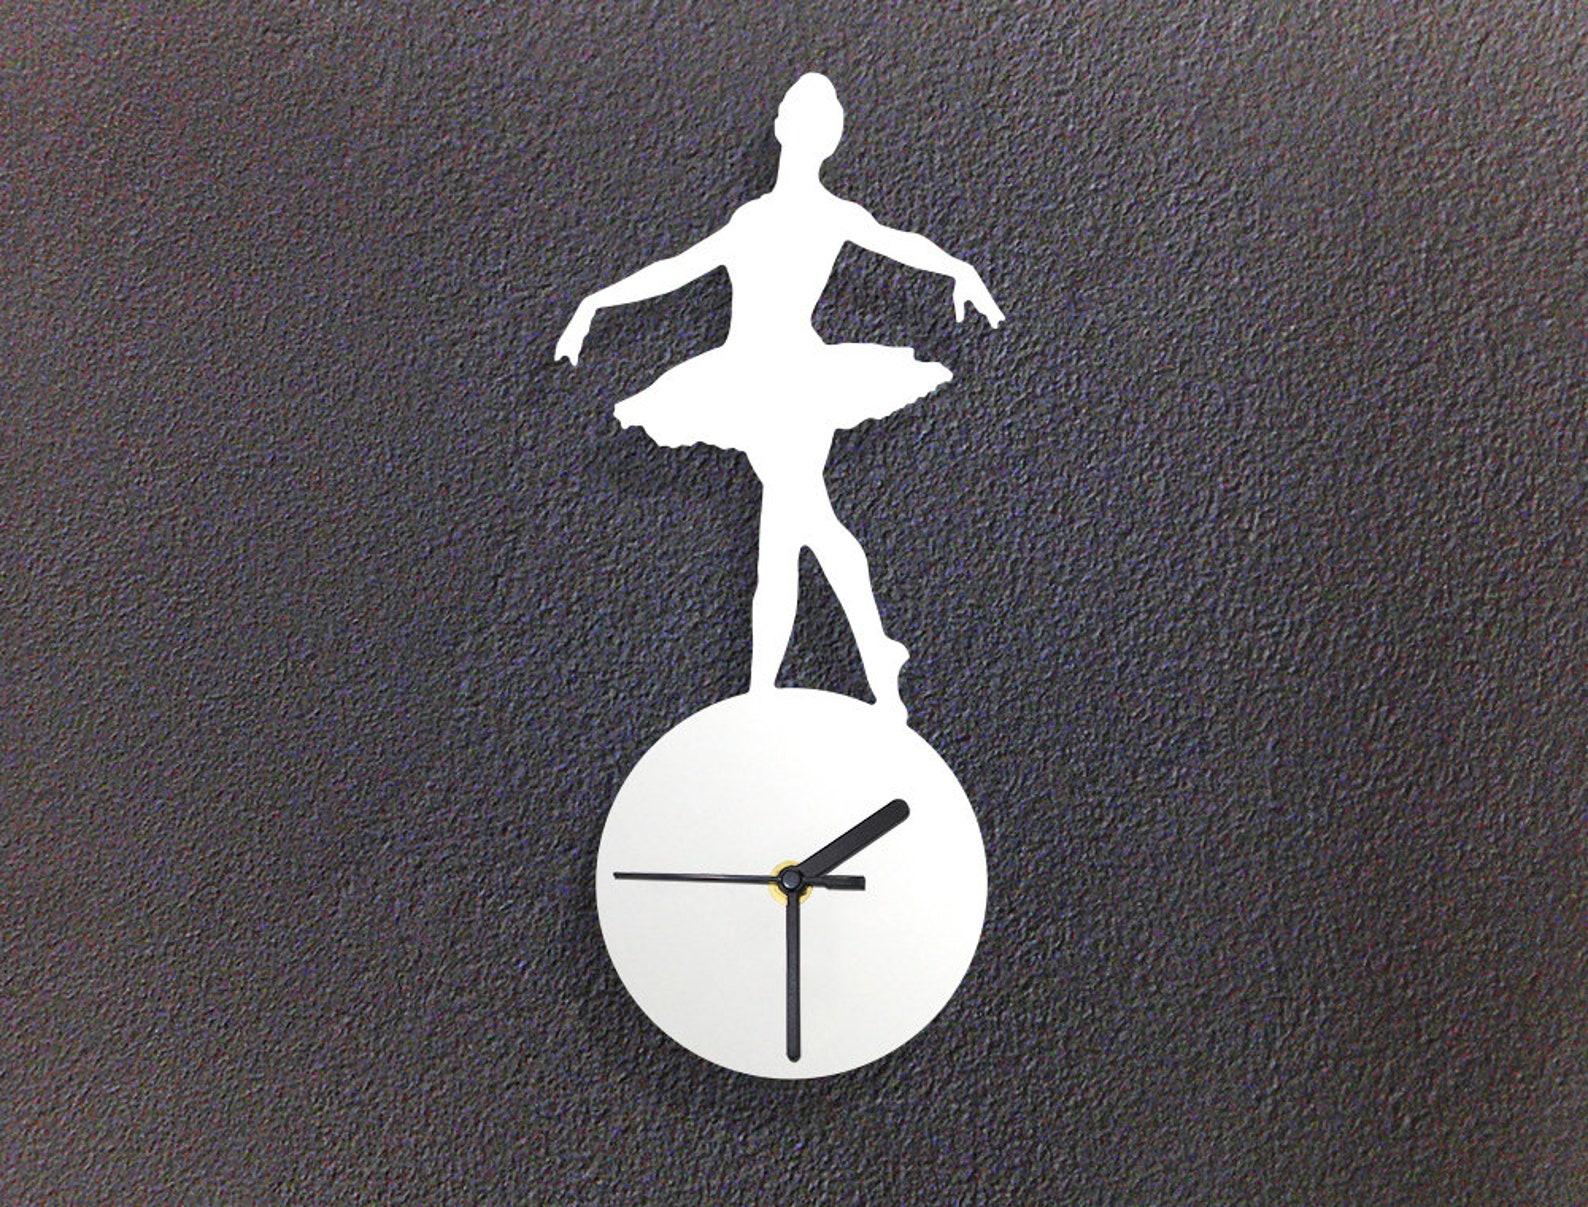 ballerina - ballet dance - pointe shoes - pirouette arabesque - dance therapy discipline - modern novelty gift - custom acrylic